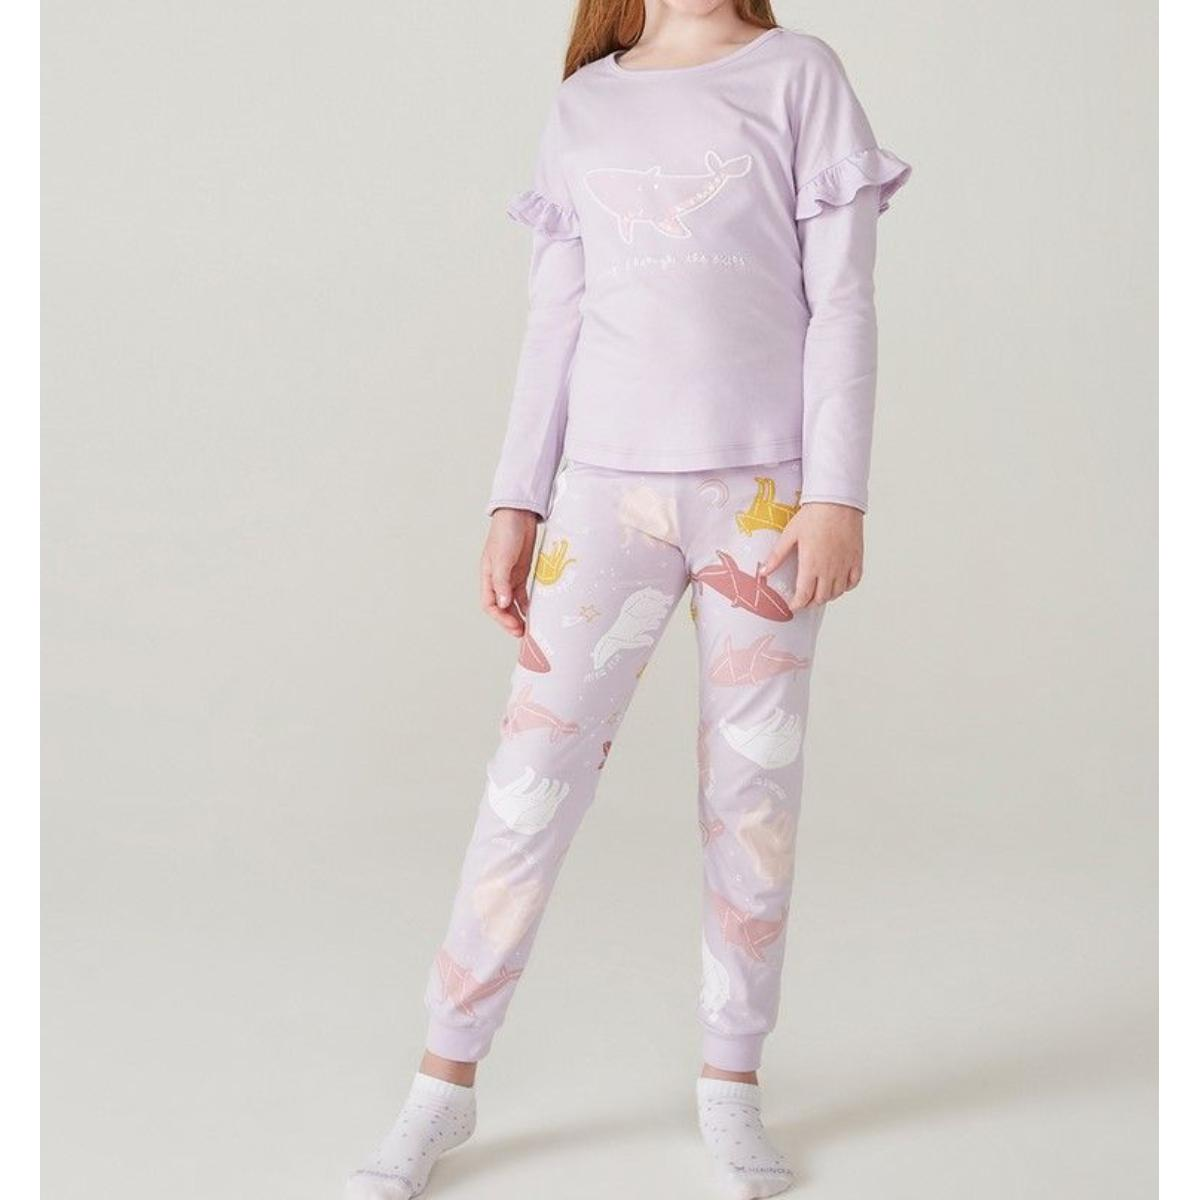 Pijama Feminina Hering Kids 565f 1cen Lilas